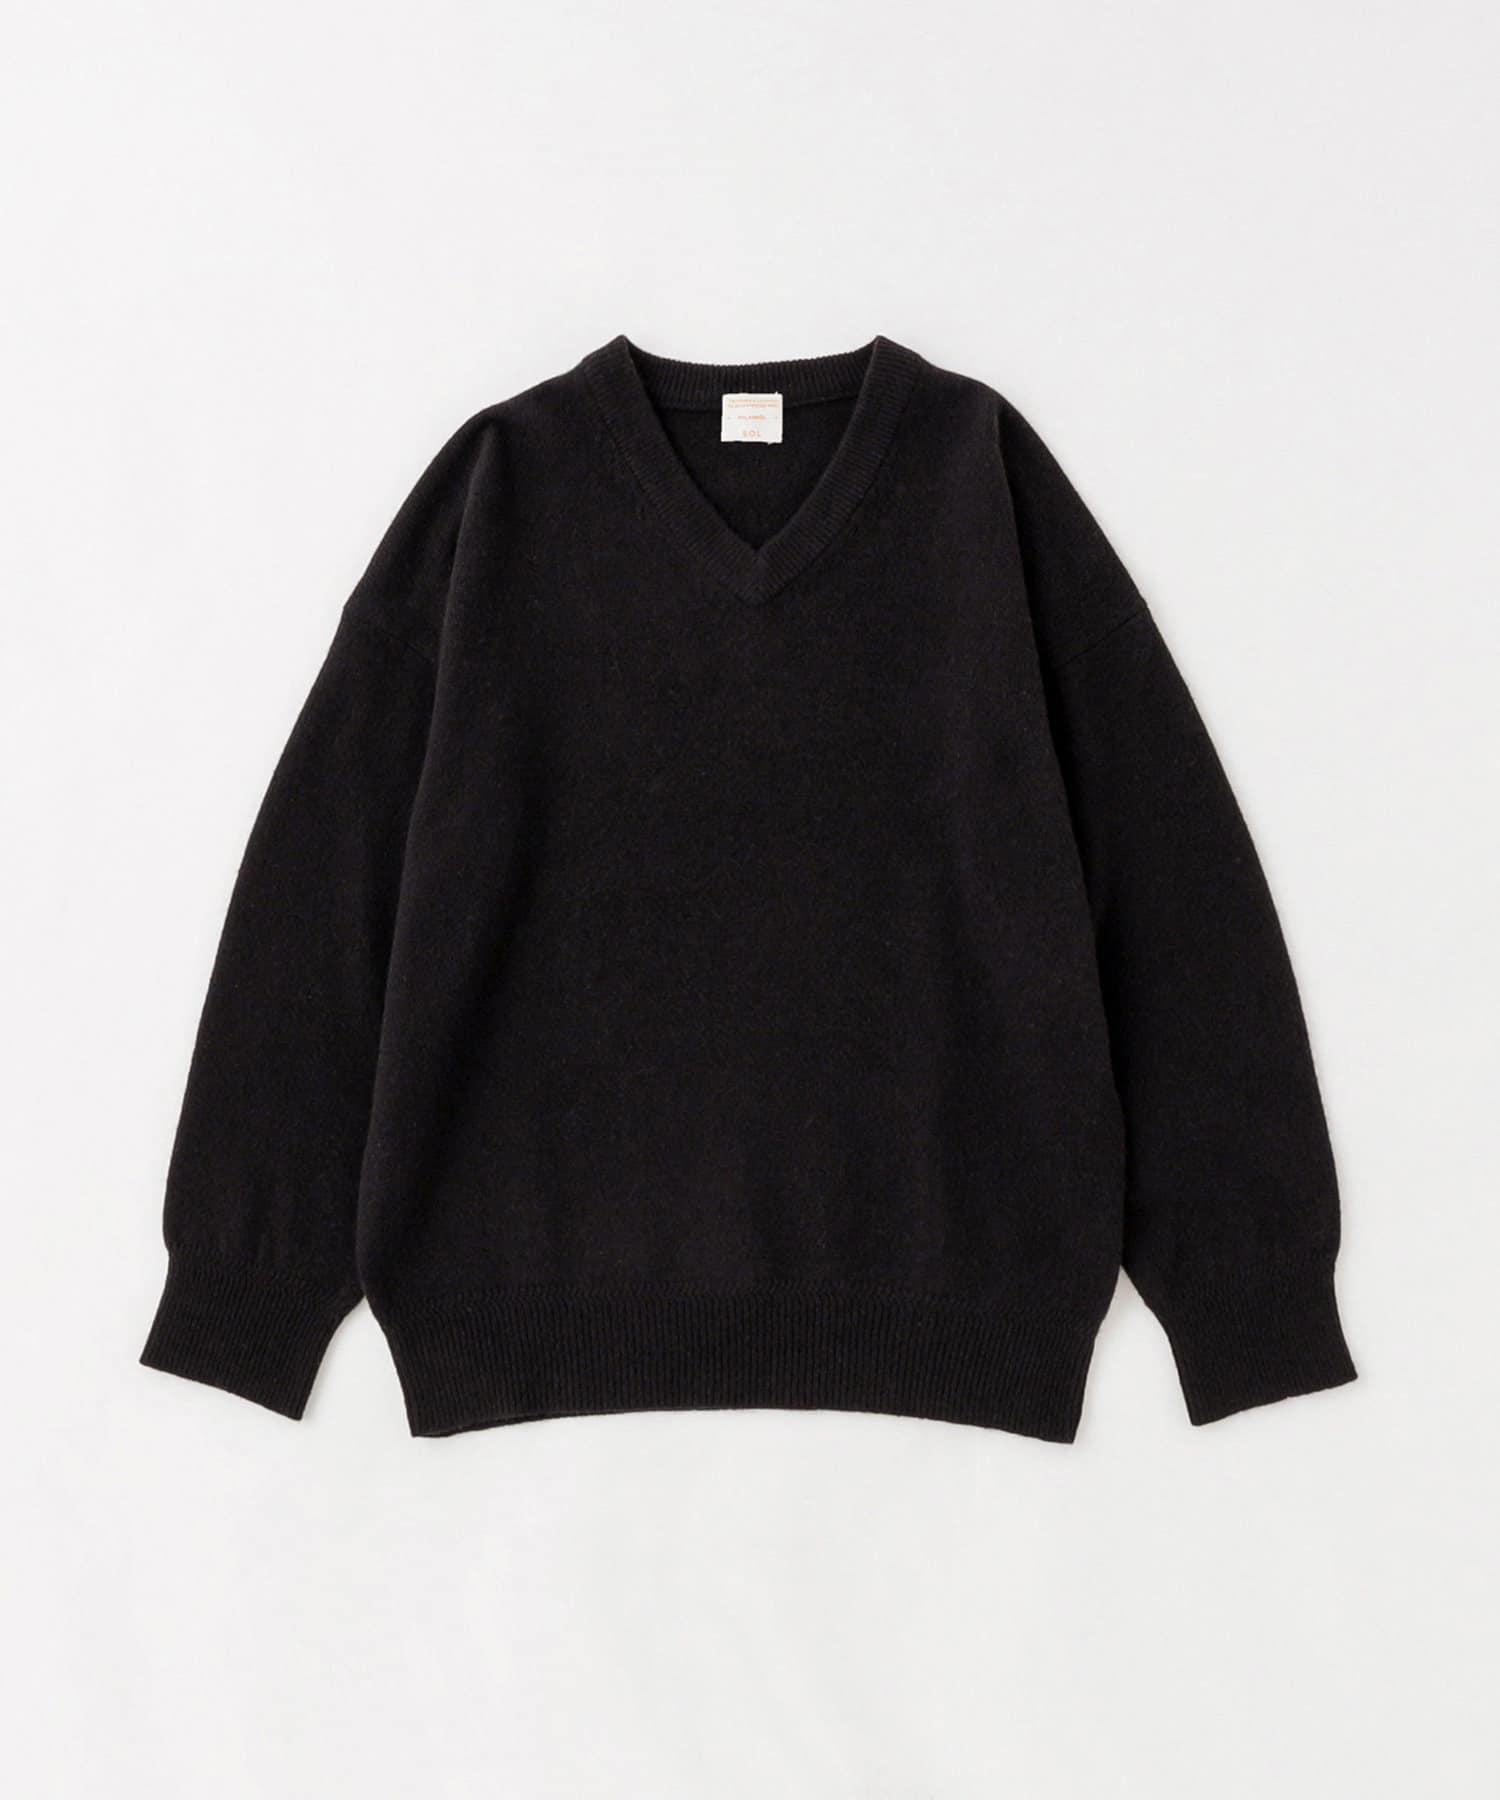 BLOOM&BRANCH(ブルームアンドブランチ) PHLANNÈL SOL / mens  Yak V-neck Knit